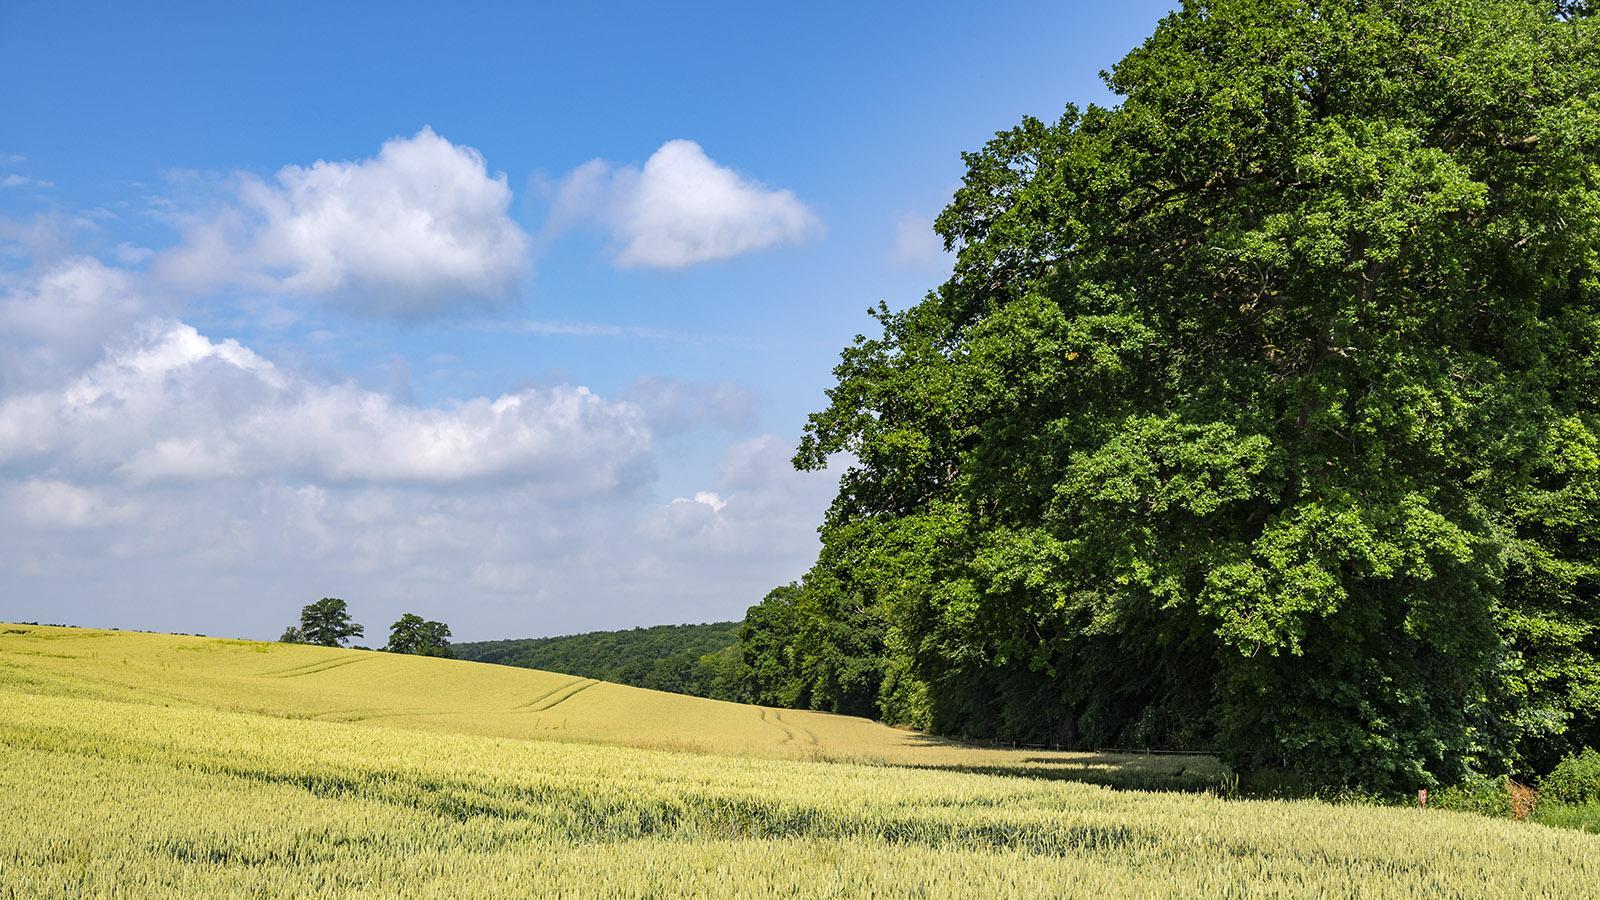 Weizenfelder unterbrechen die Forêt d'Eawy. Foto: Hilke Maunder